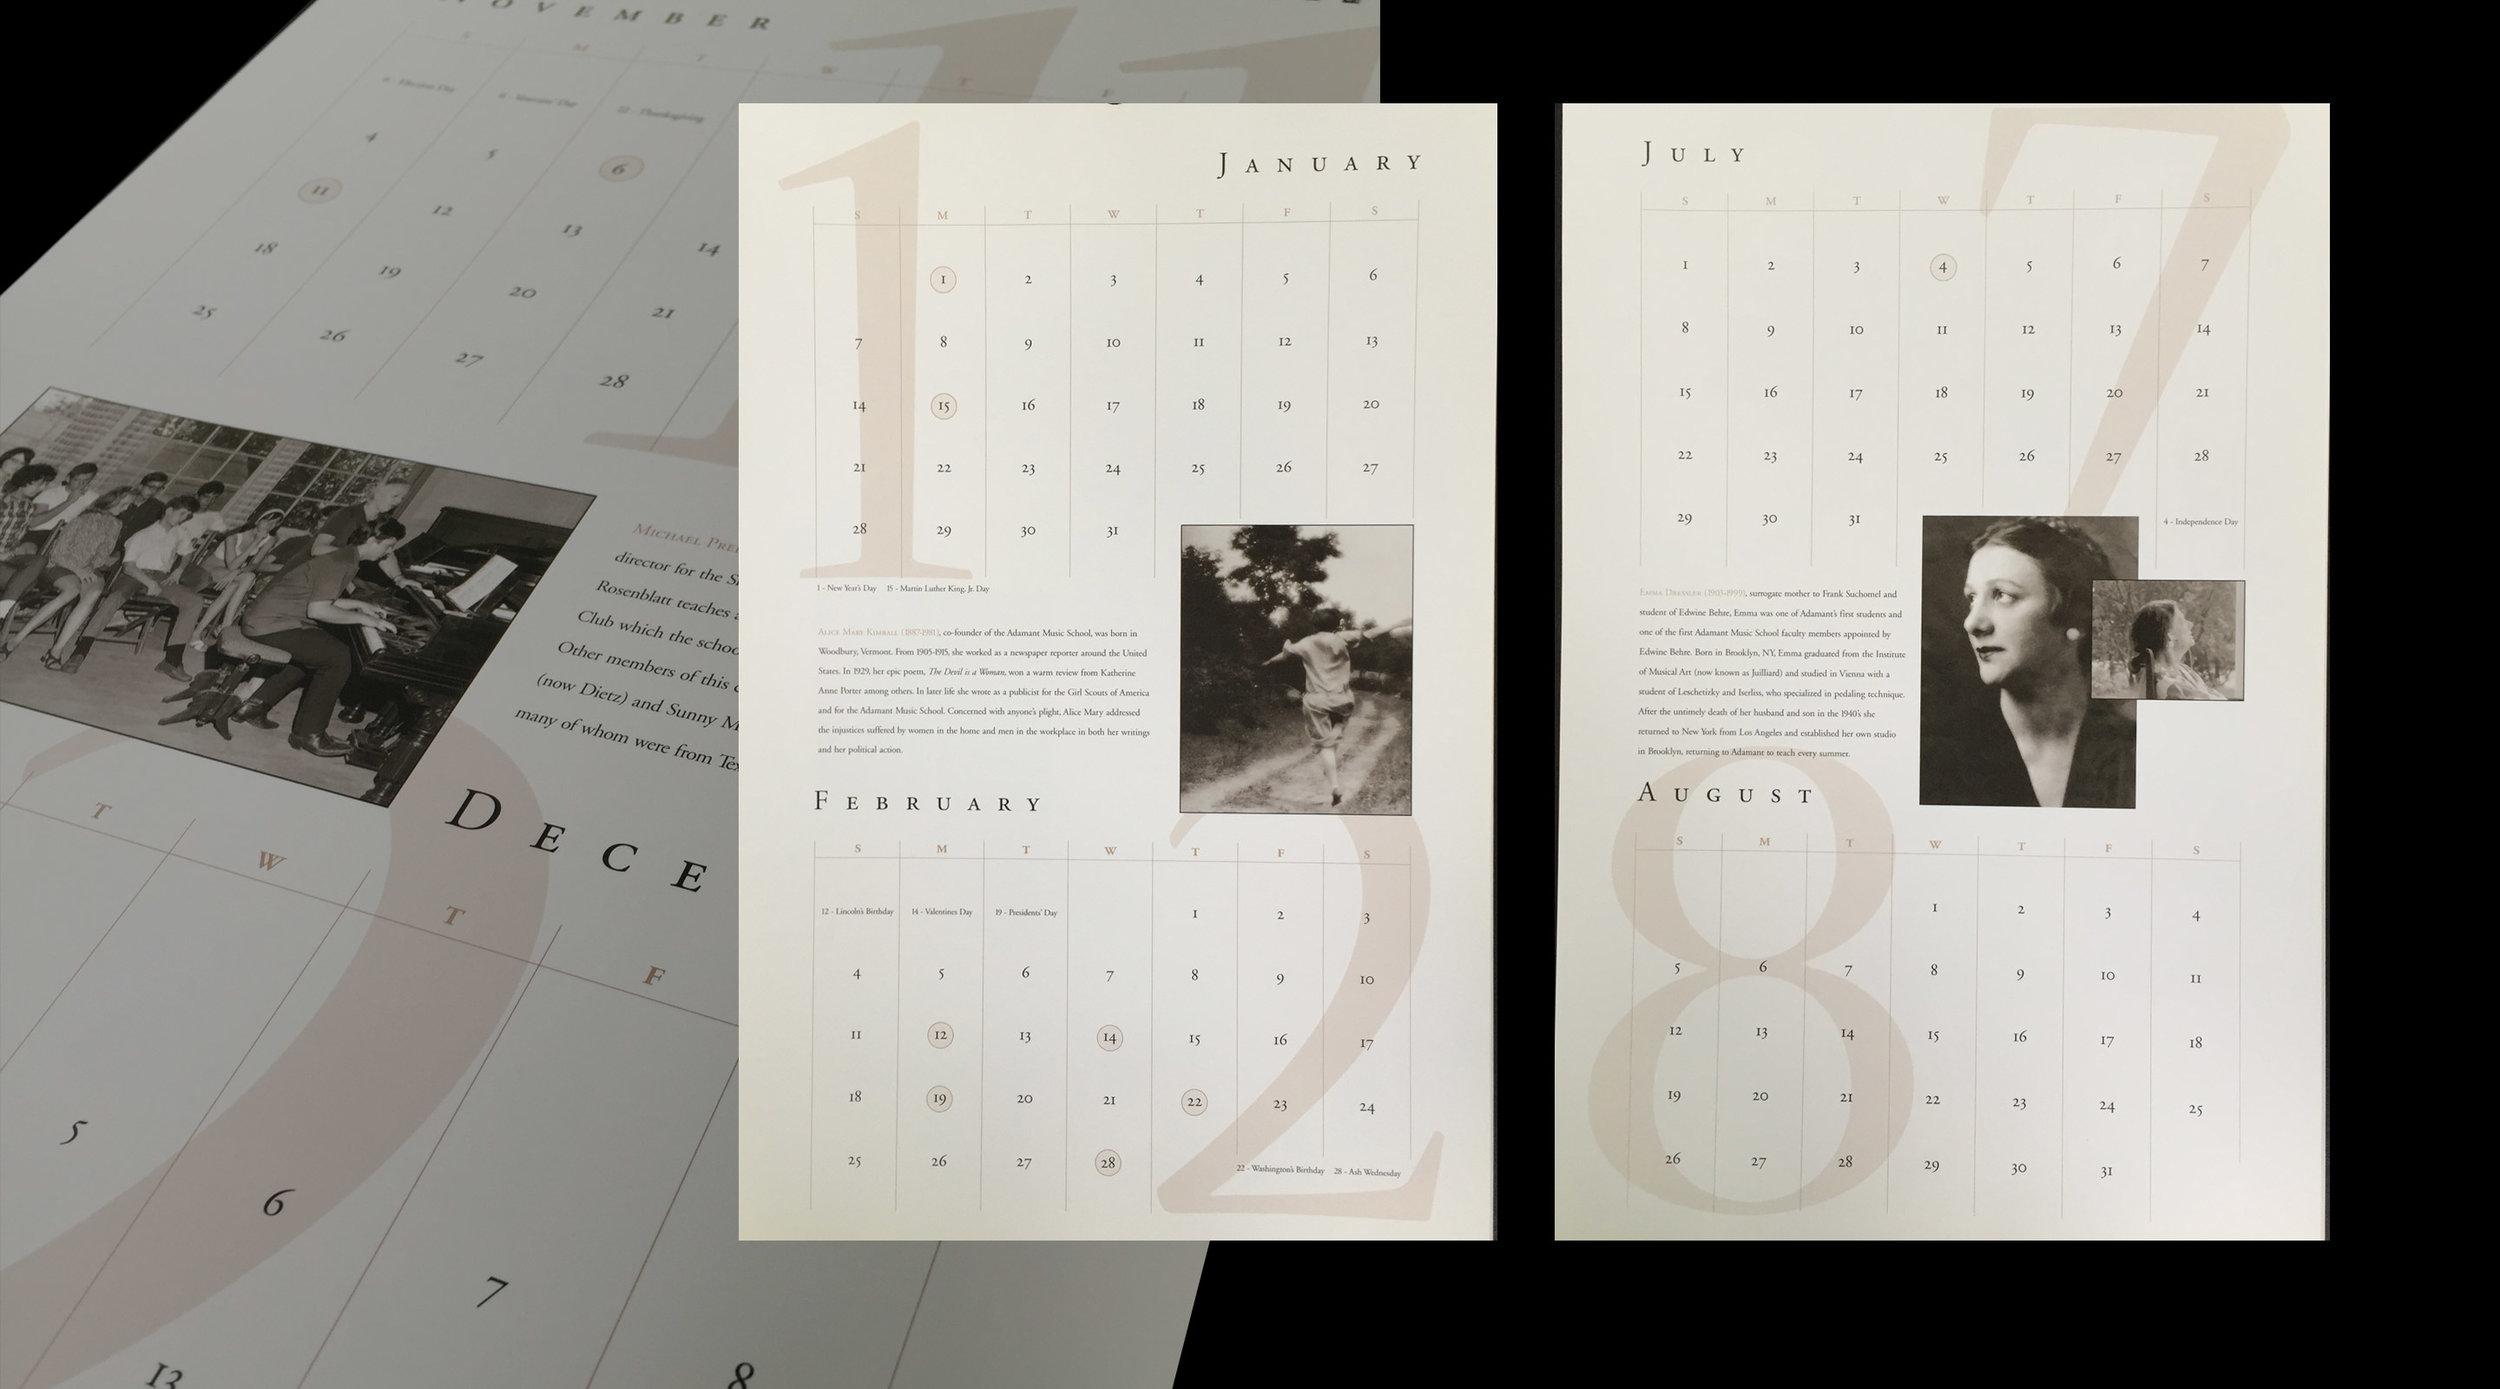 Adamant-music-calendar.jpg